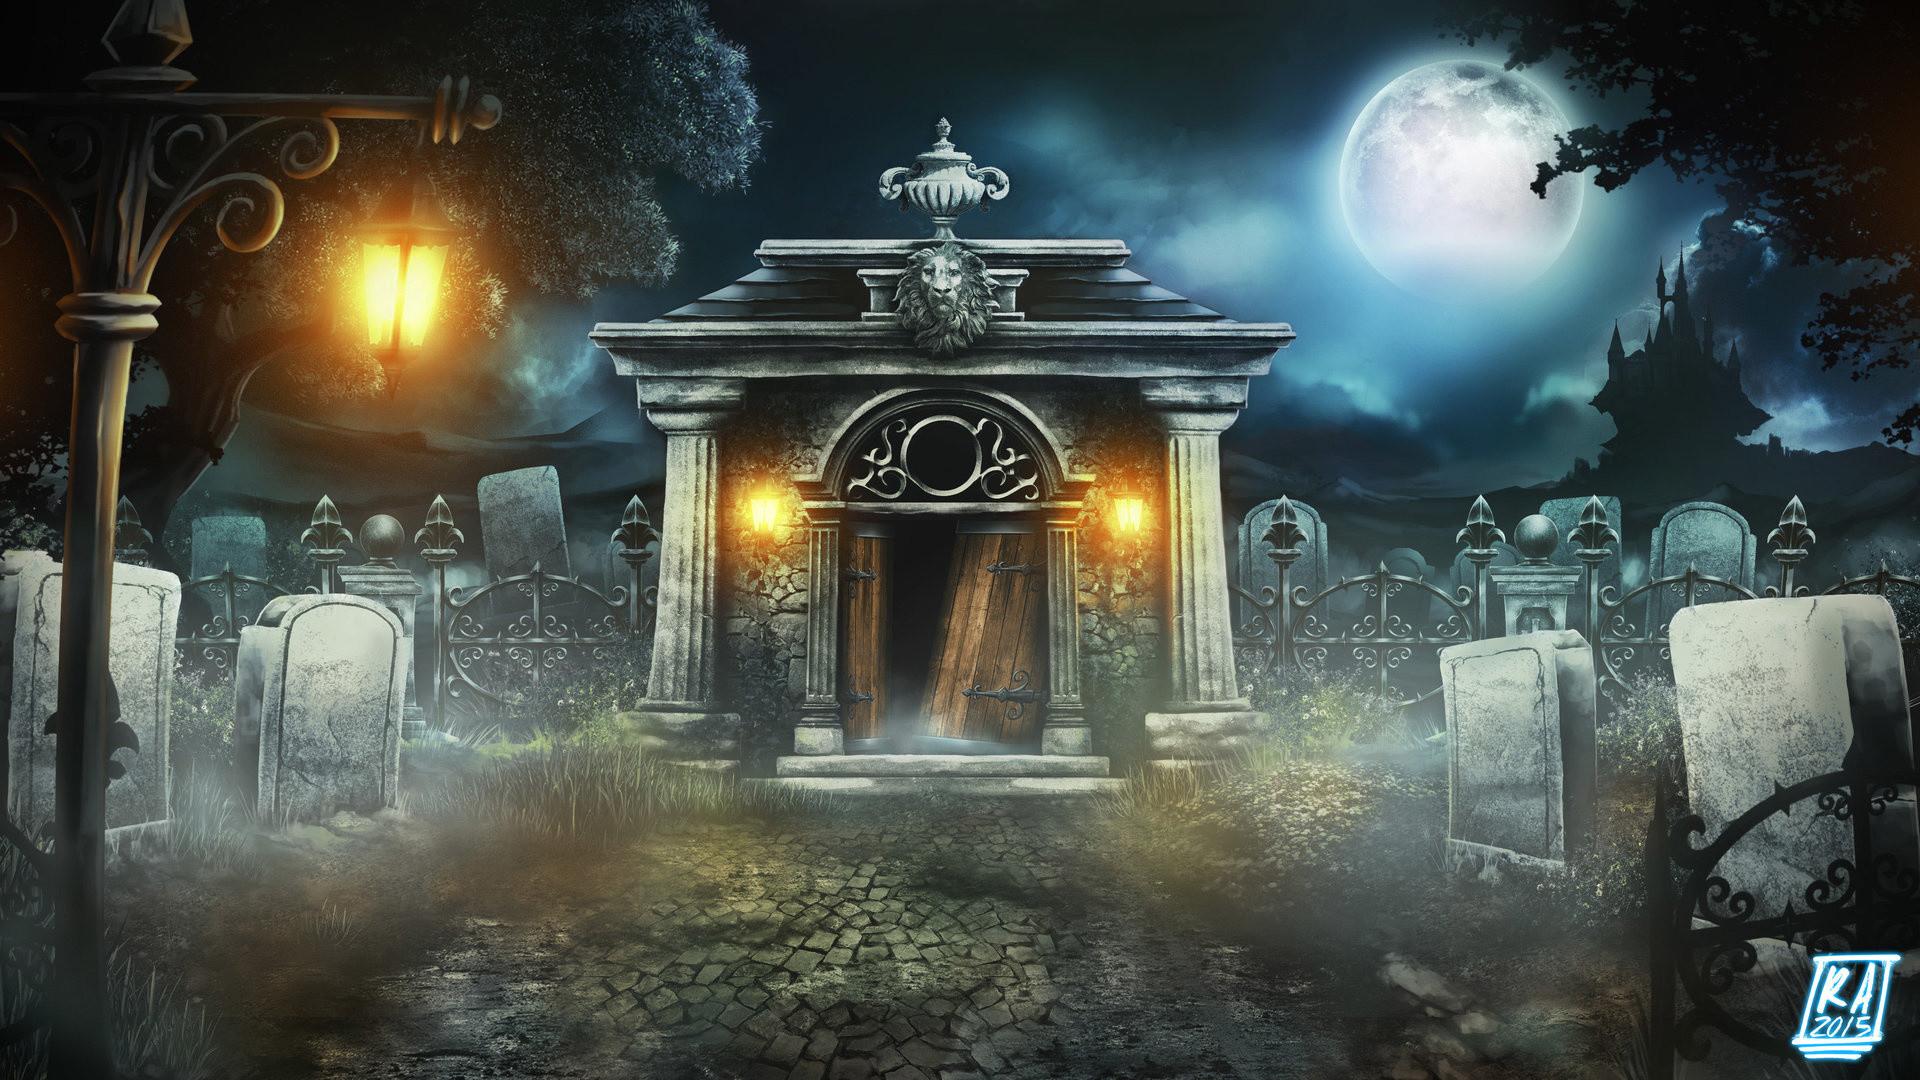 Res: 1920x1080, Halloween, Moon, Moonlight, Dracula Castle, Tombs, Crypt, Halloween Crypt On